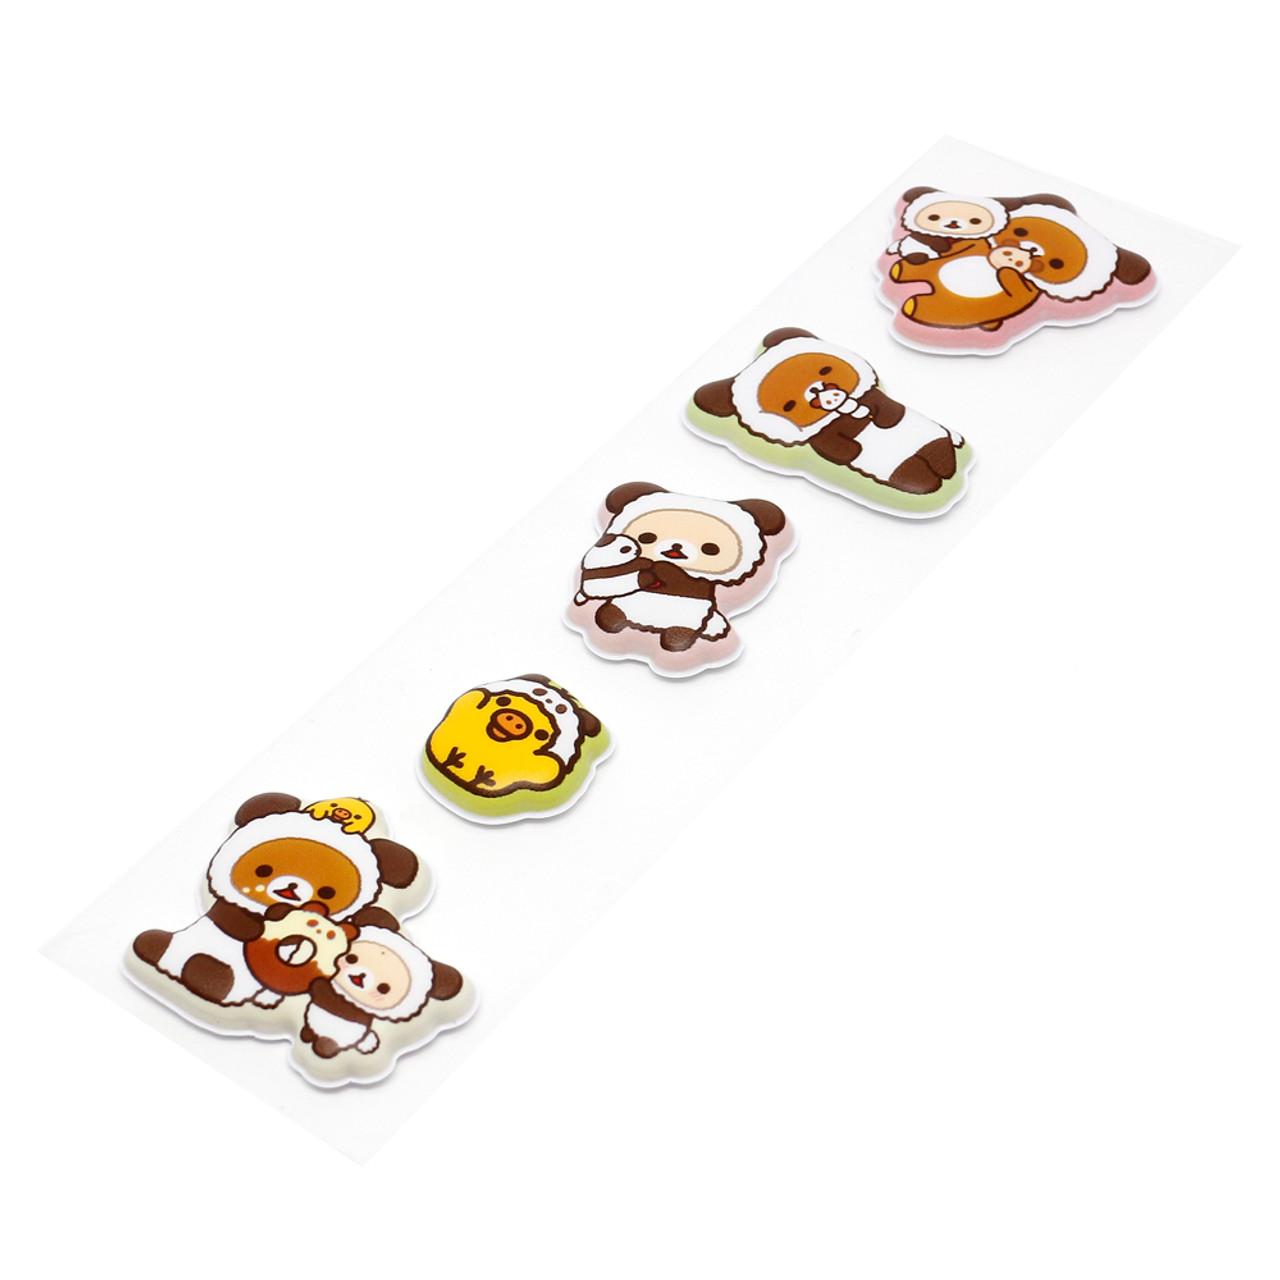 San-x Rilakkuma Relax Bear Panda Costume With Clover Sticker SE27702 ( Sticker View )